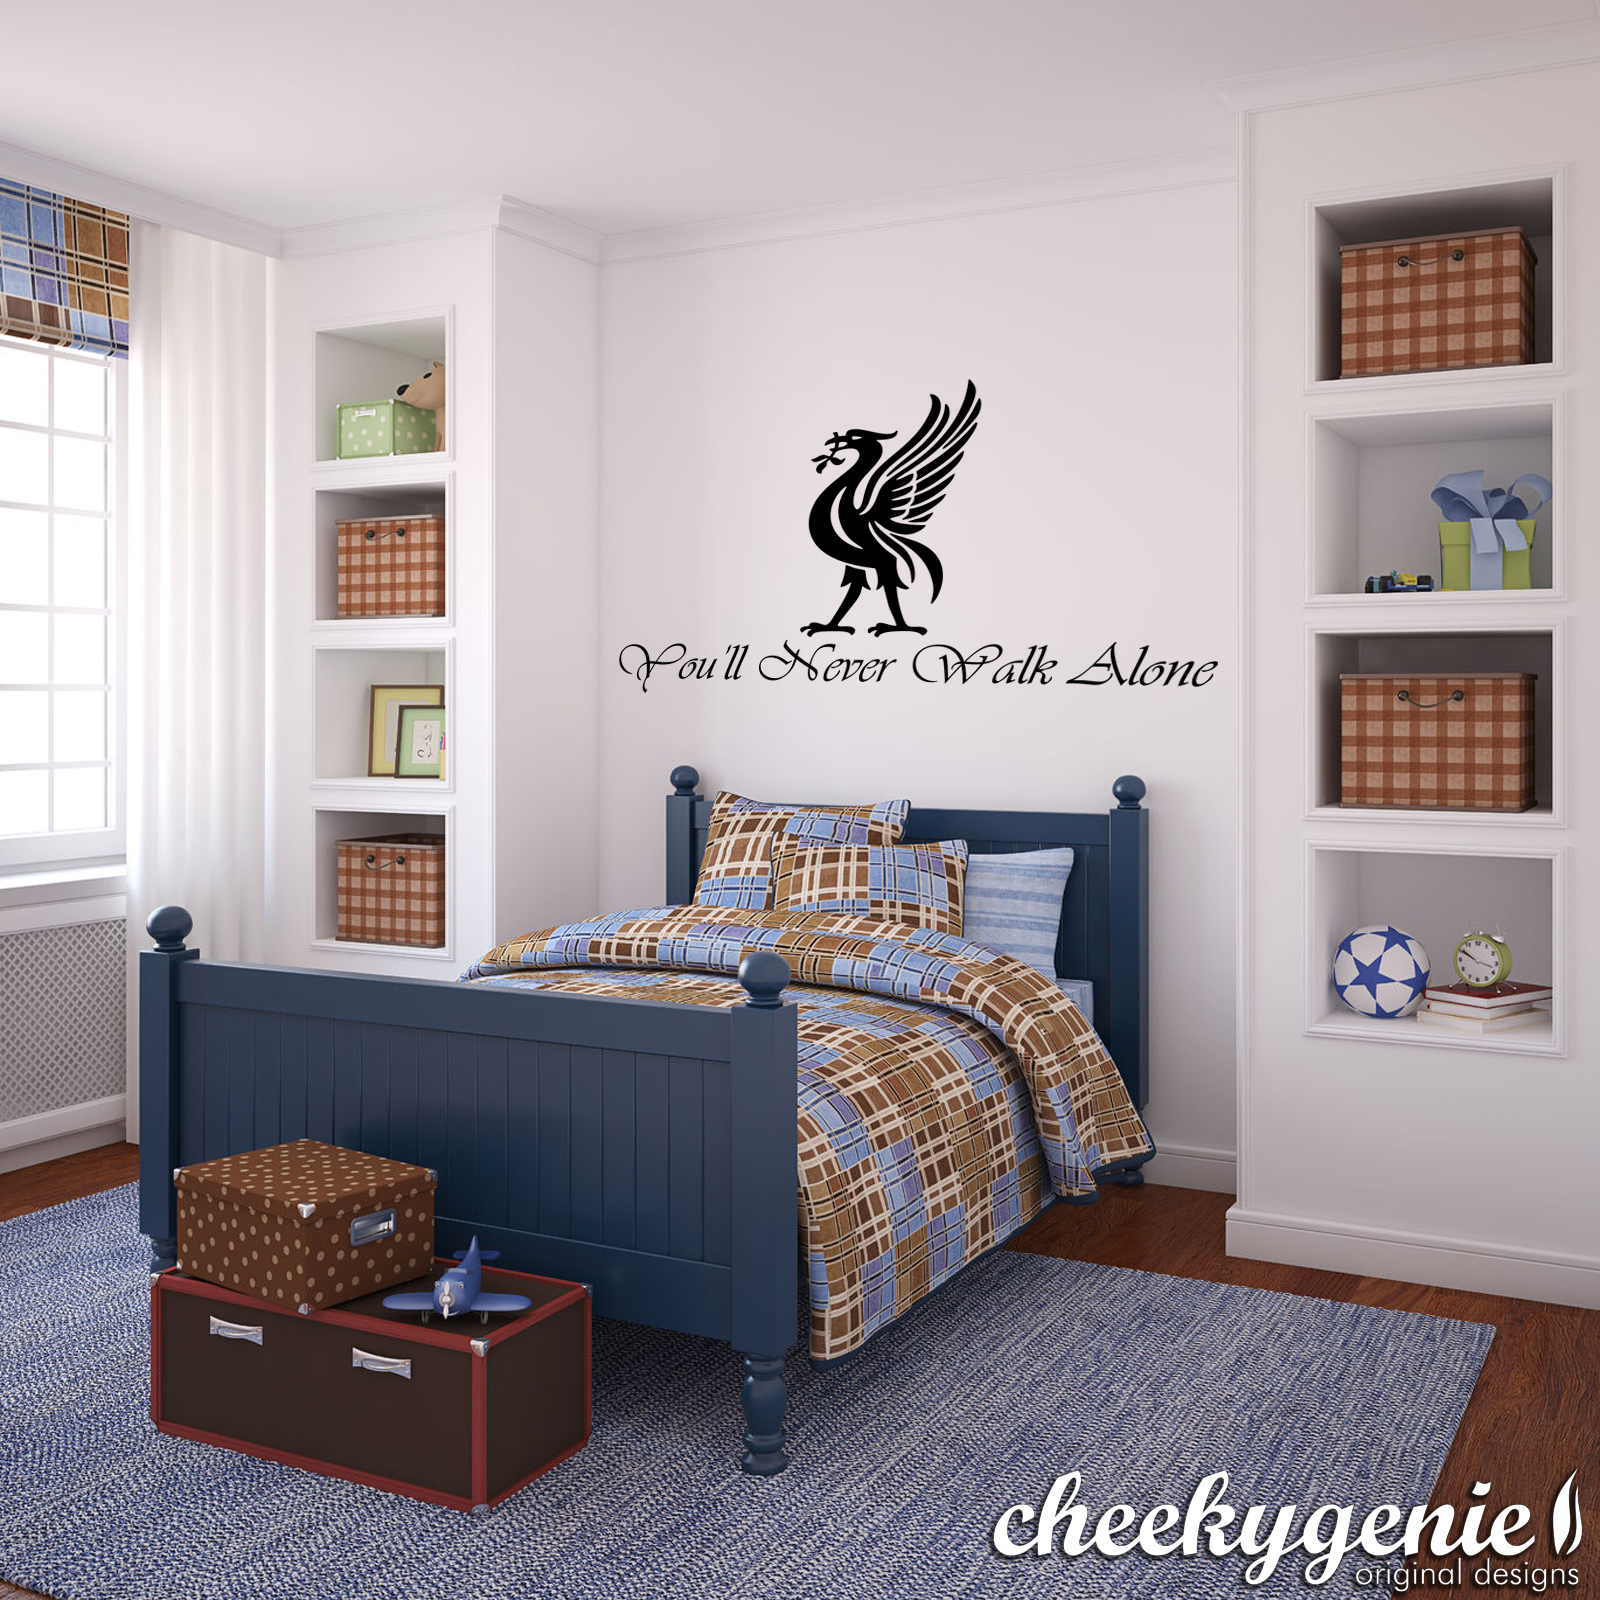 Liverpool Bedroom Accessories Liverpool Fc Football Mural Vinyl Wall Art 034you039ll Never